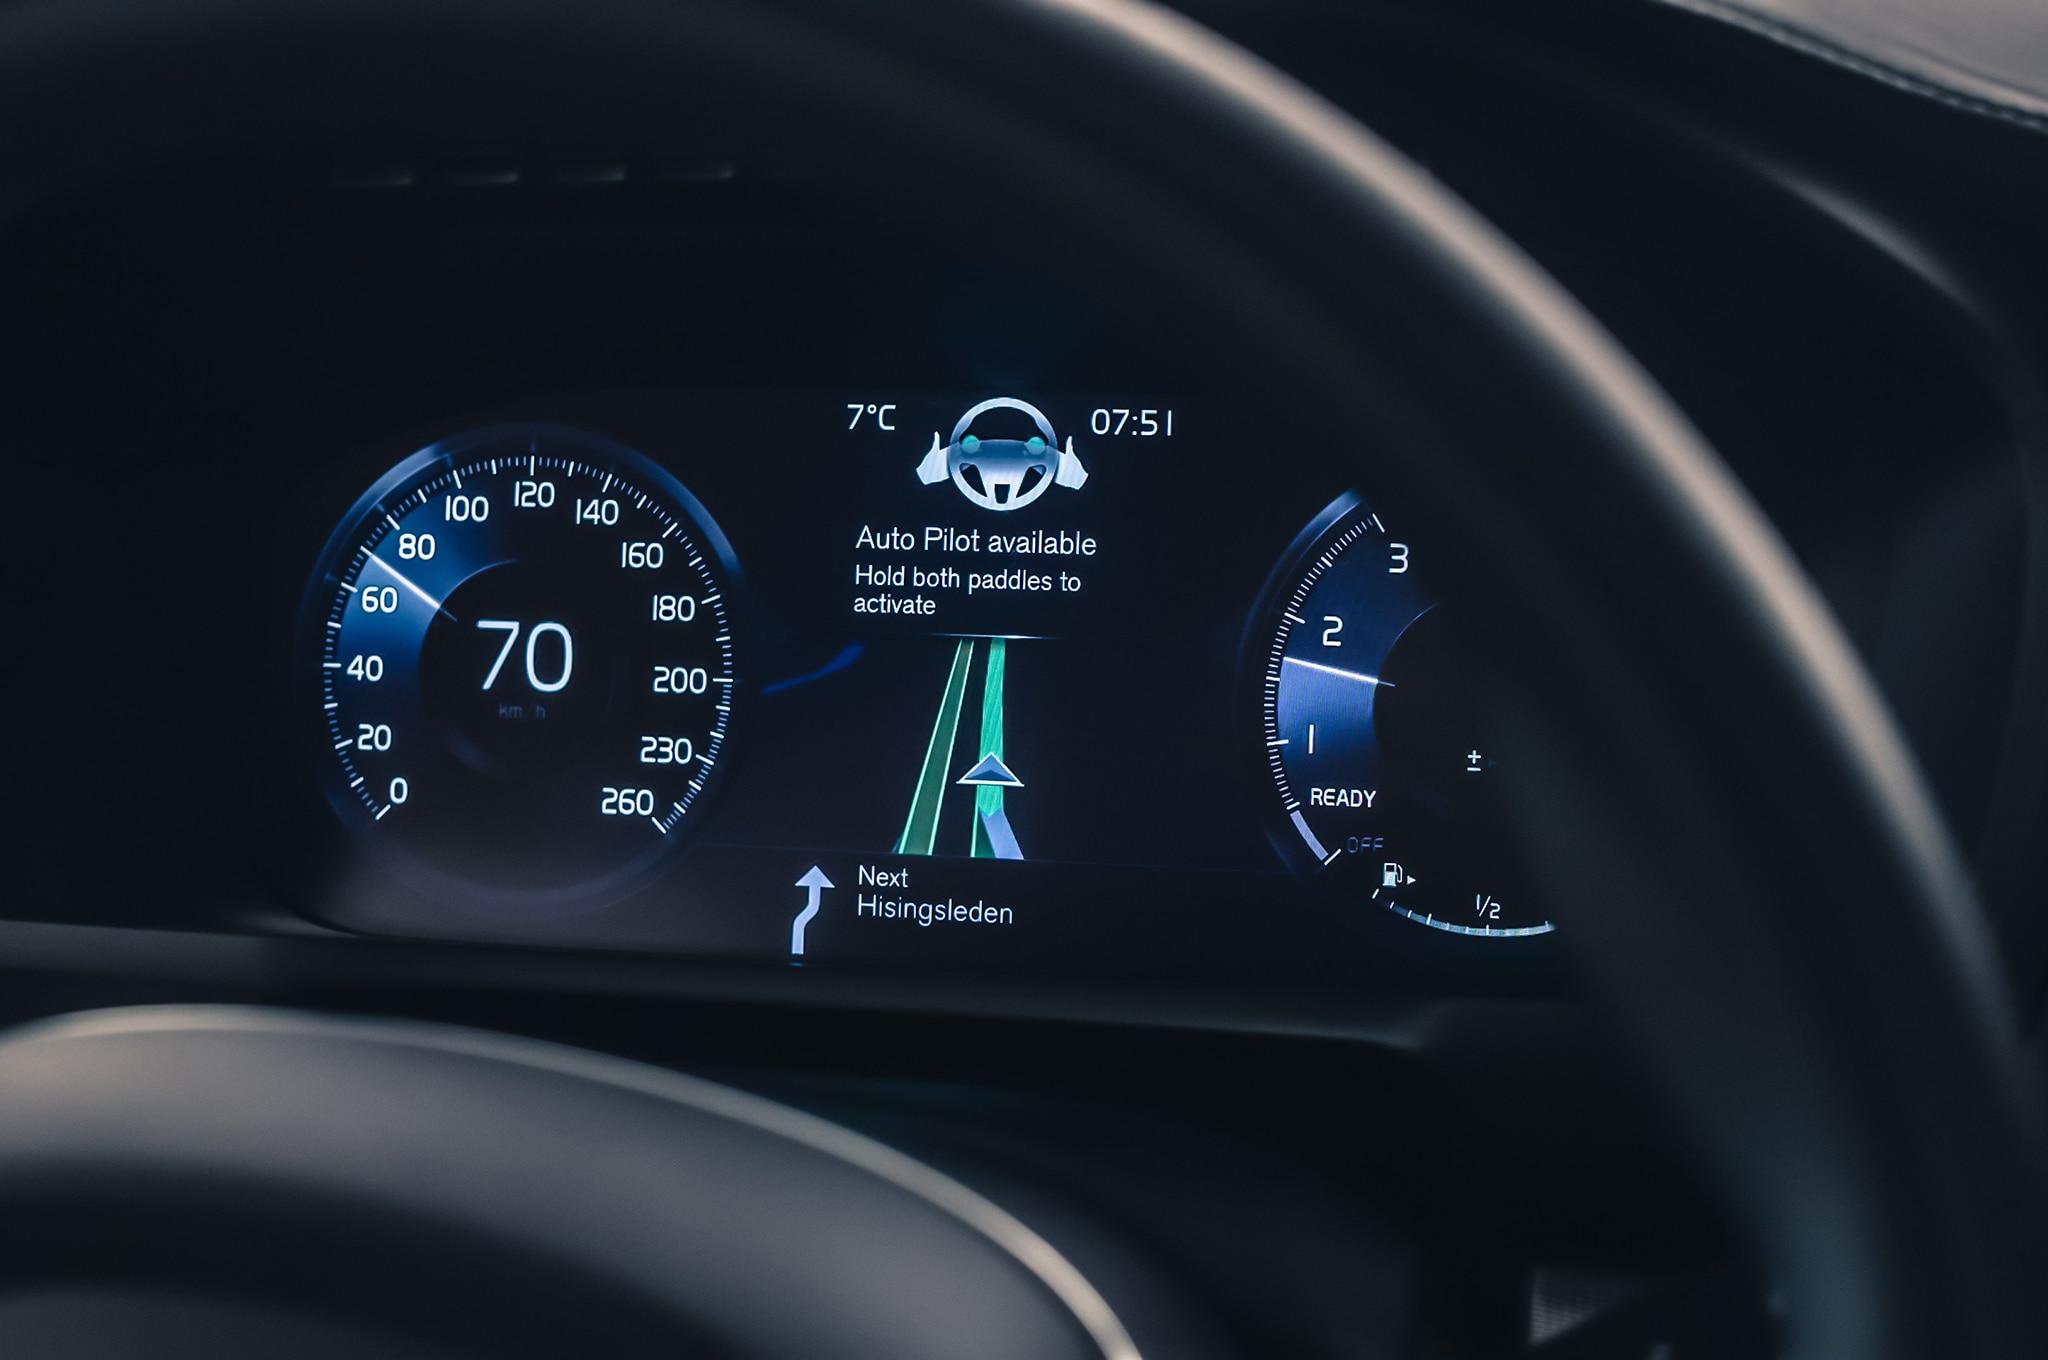 Volvo XC90 IntelliSafe Autonomous Interface 1